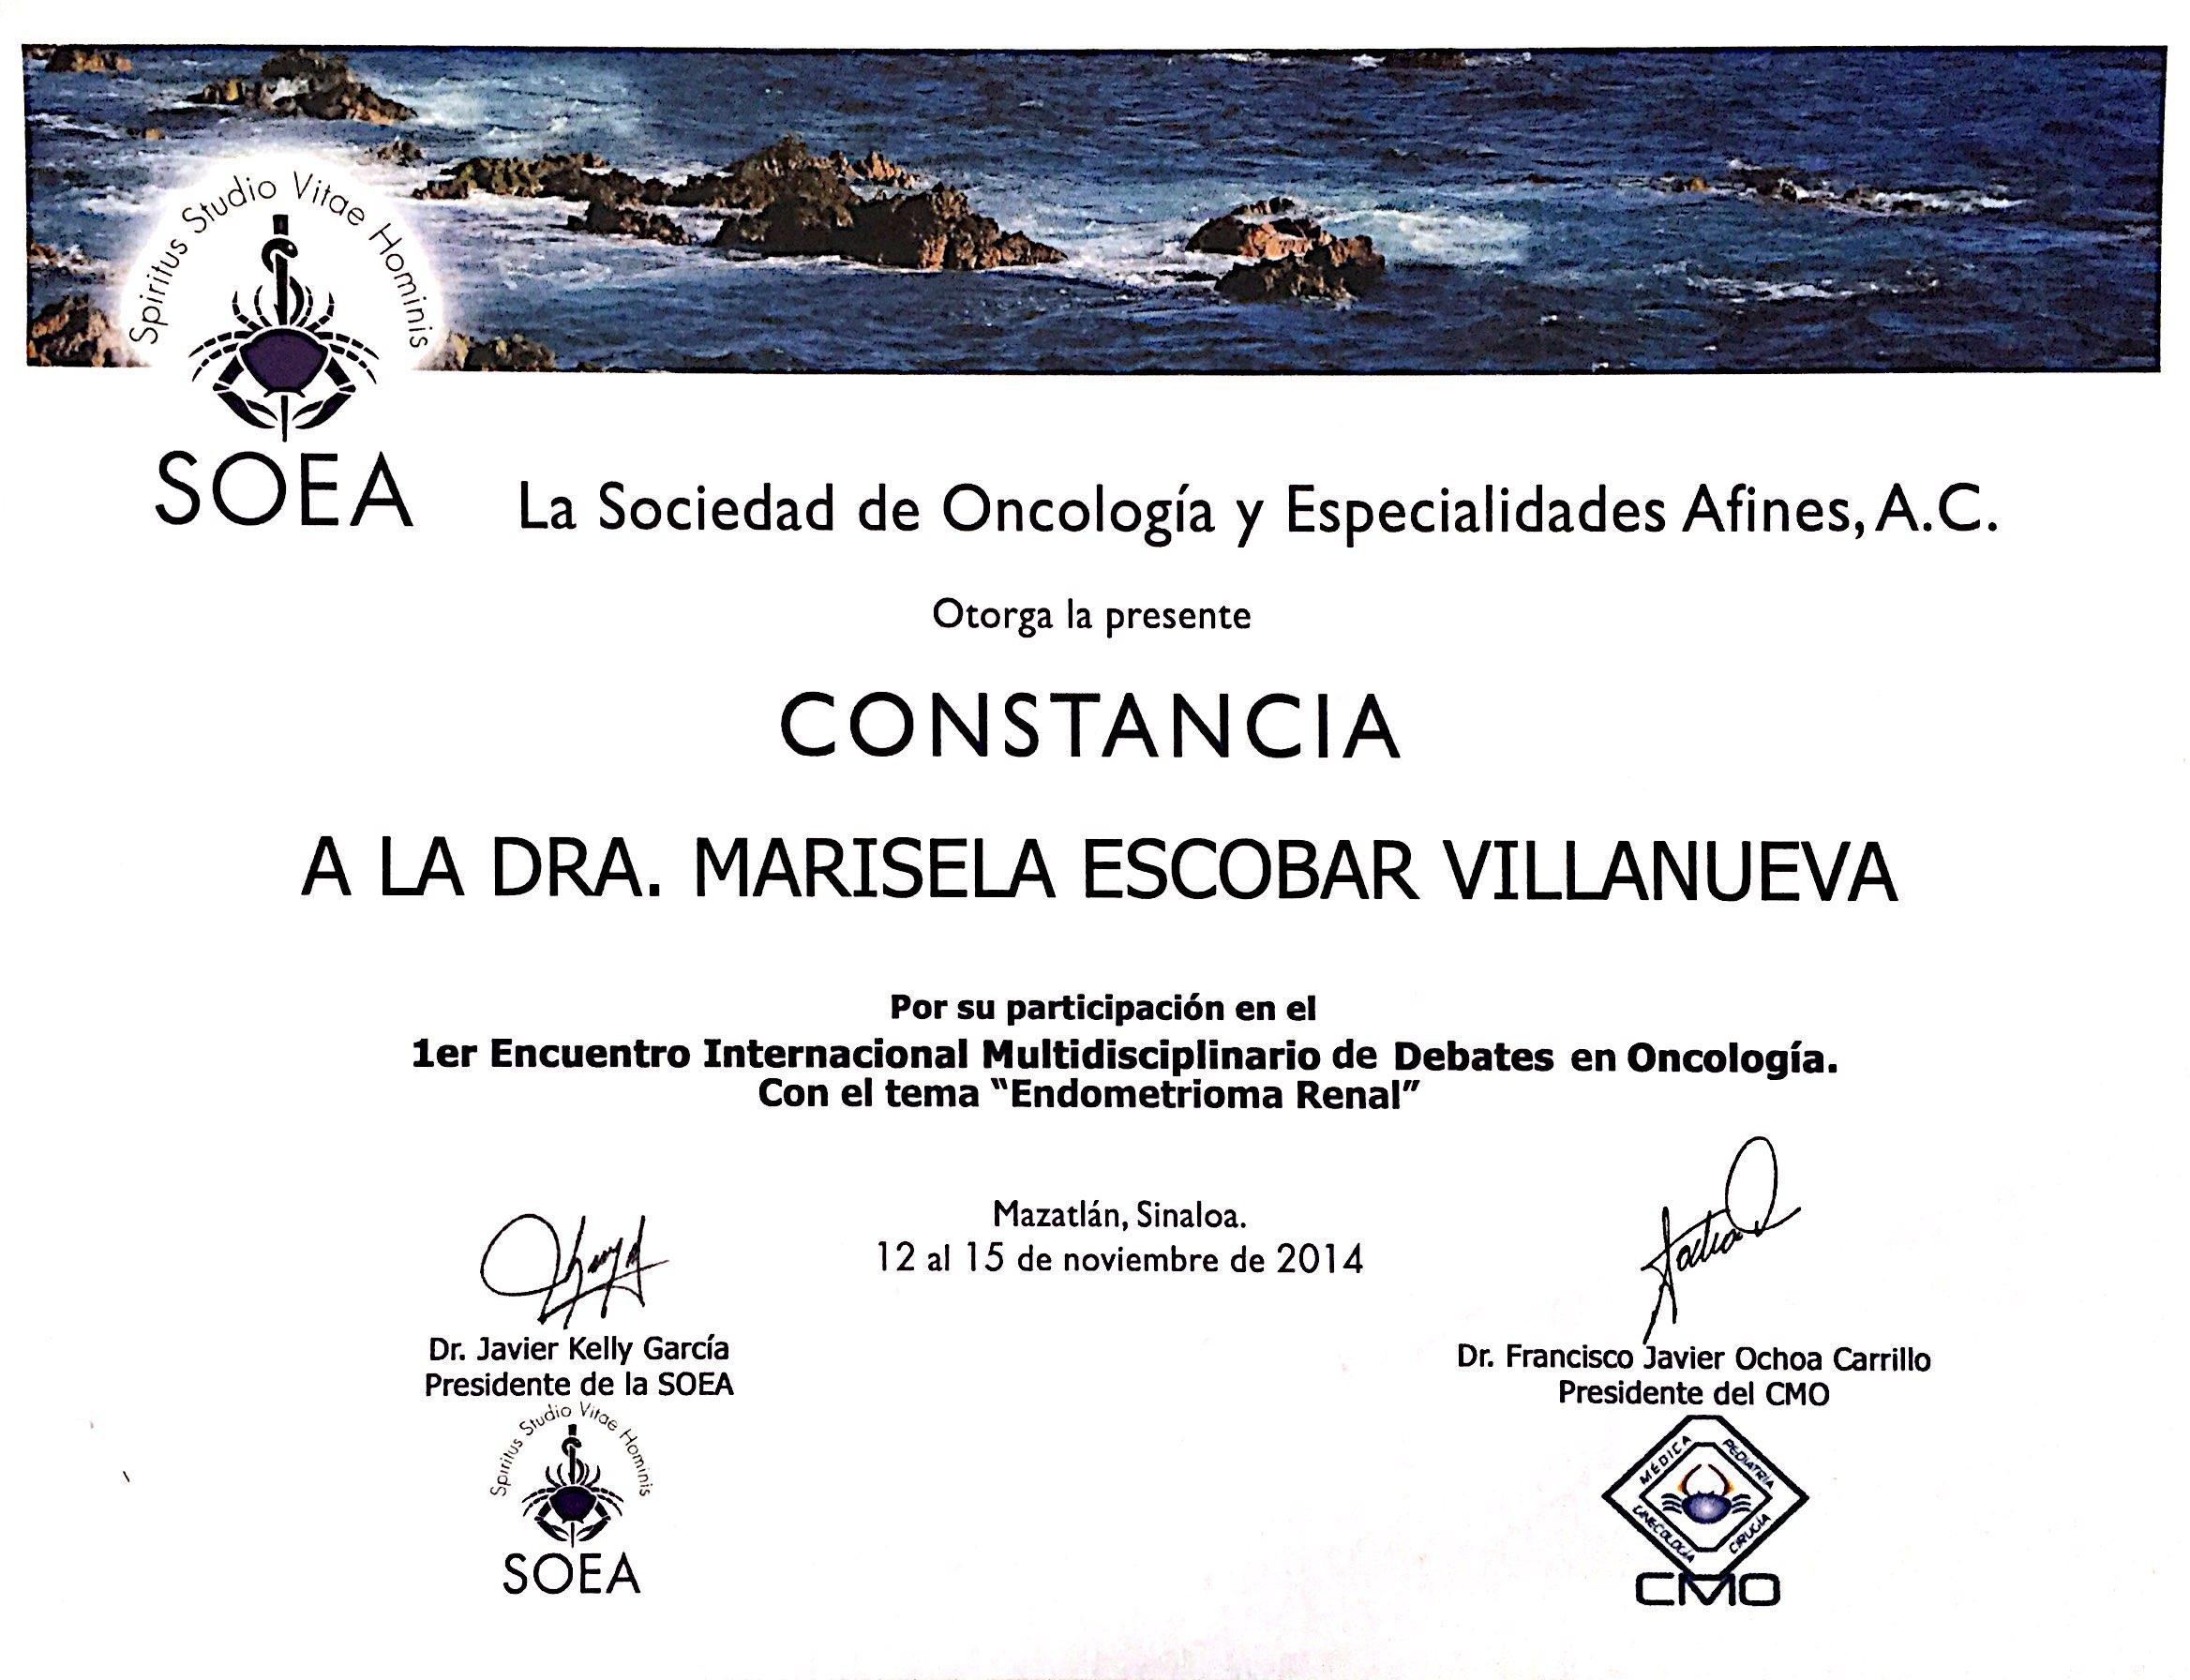 Nuevo doc 2018-02-20 11.21.39_39